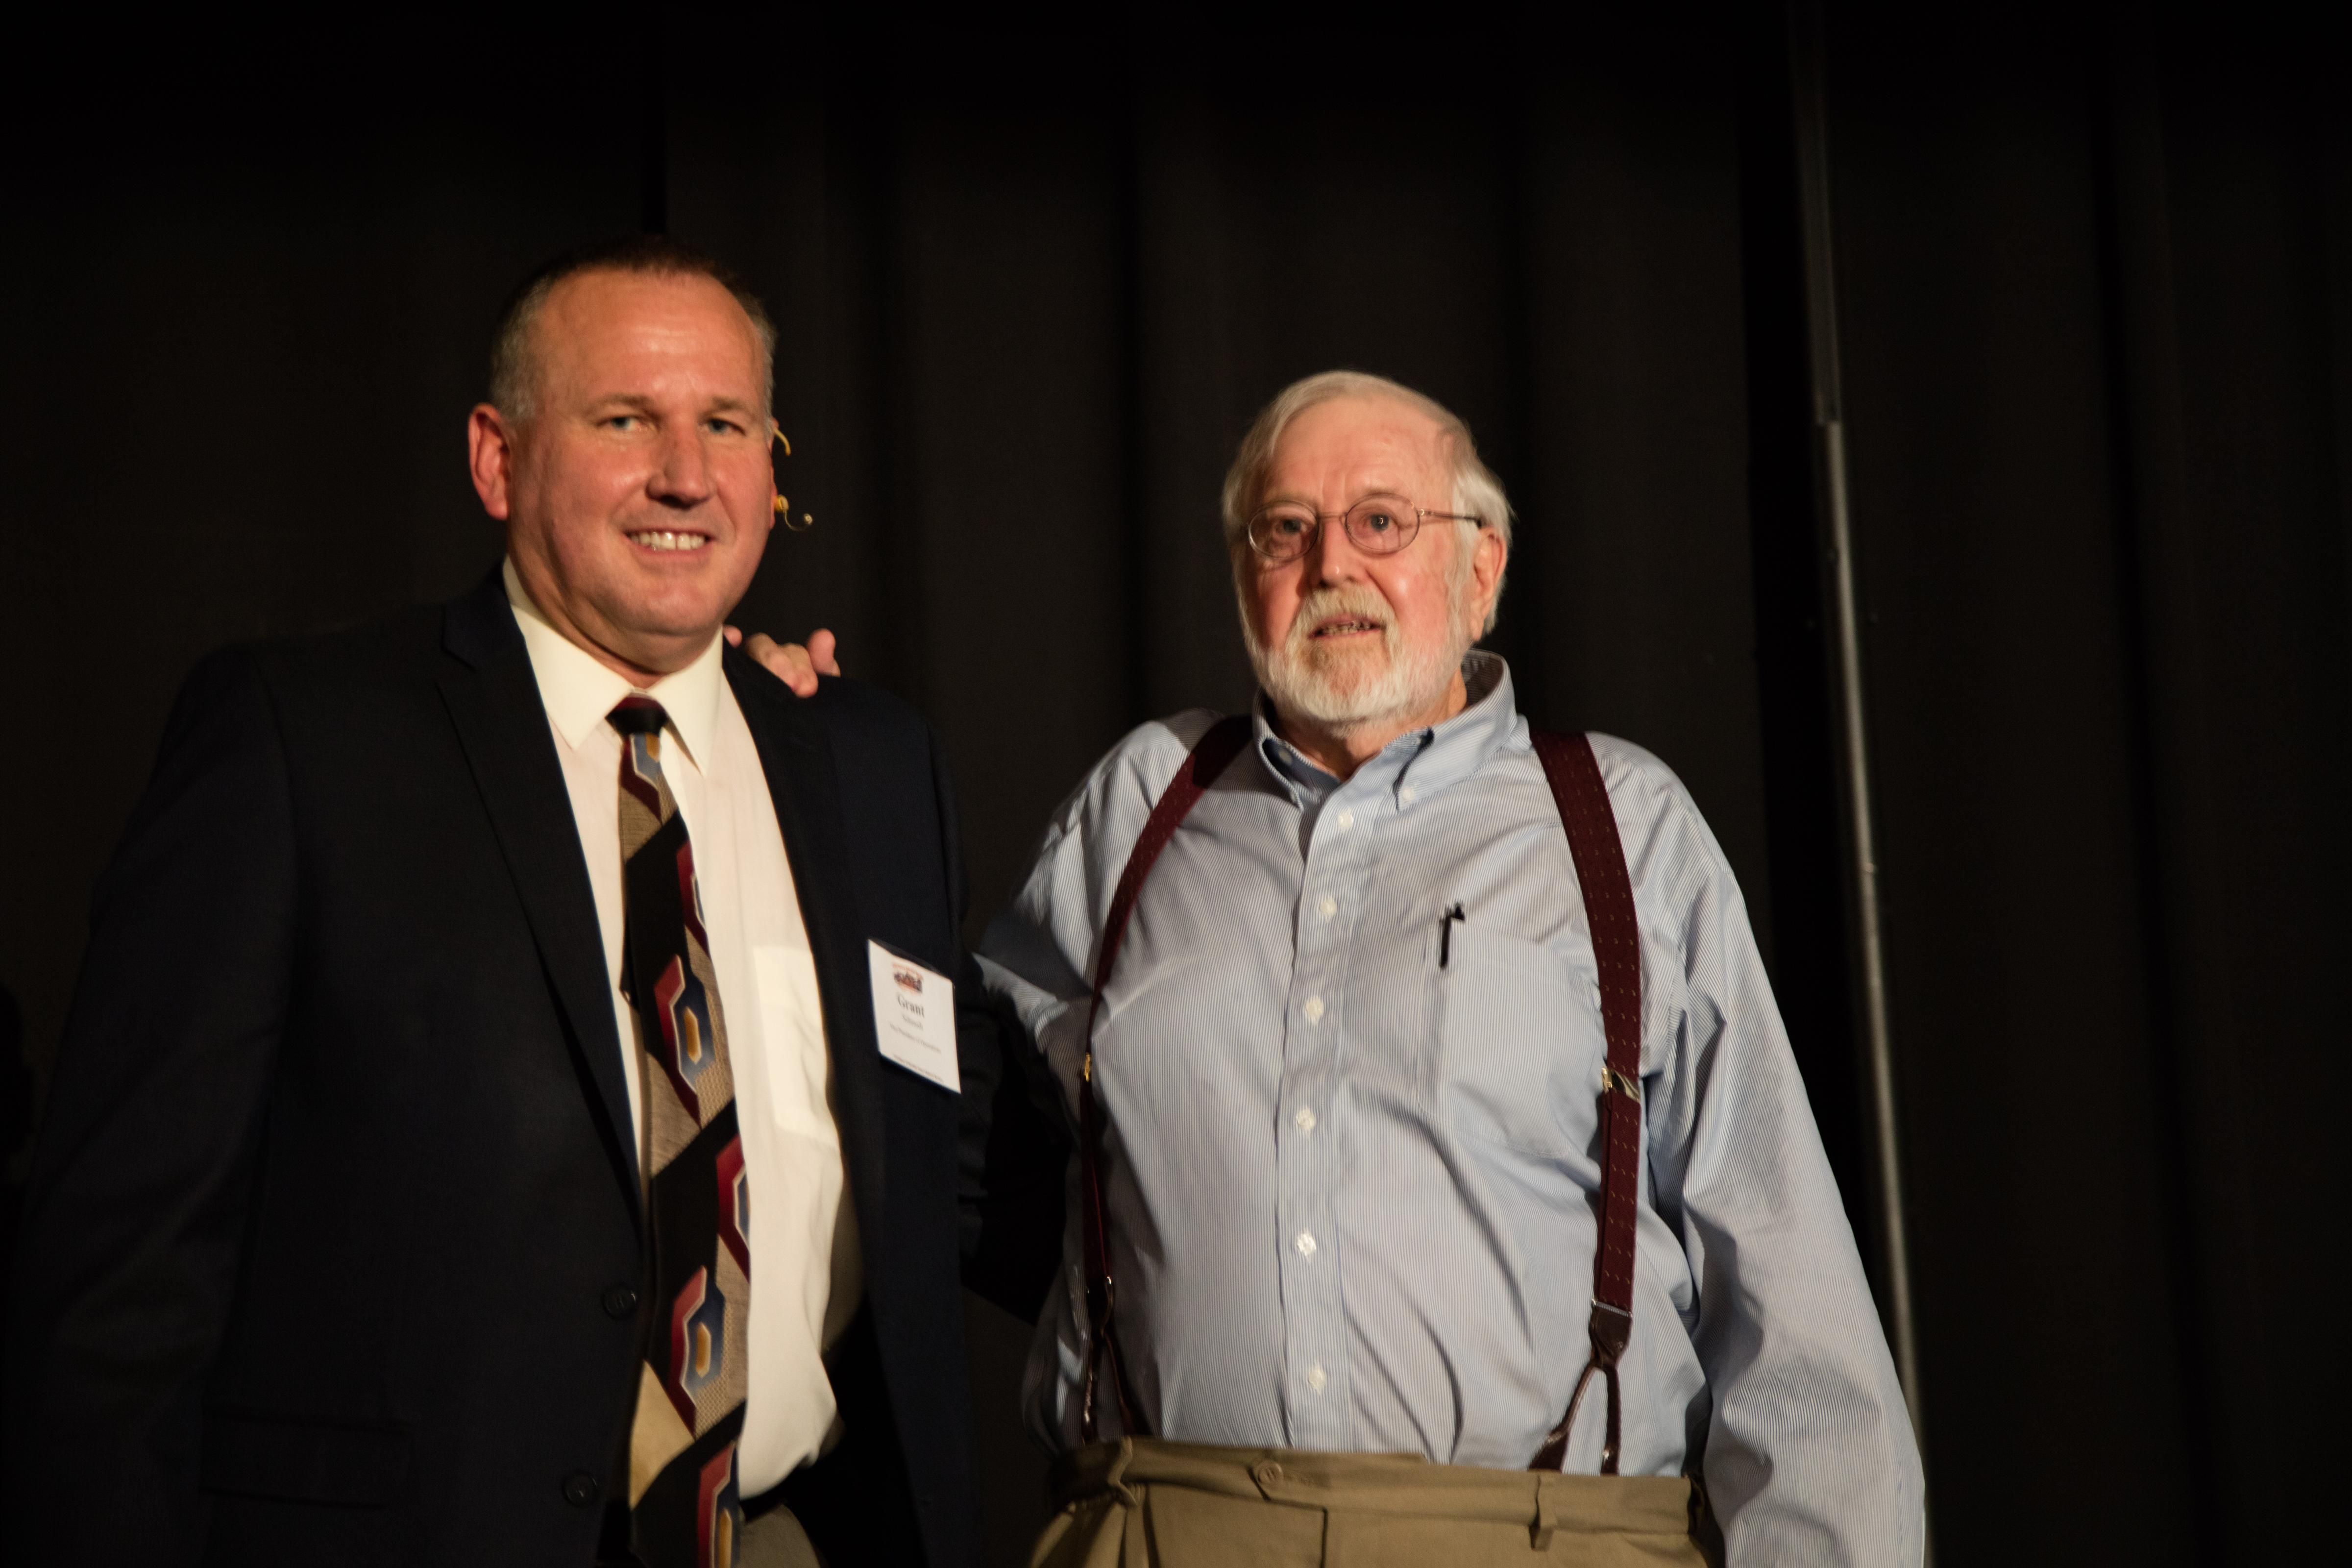 Grant Schmidt, OGT's VP and Pastor Ray Wilke, OGT's President